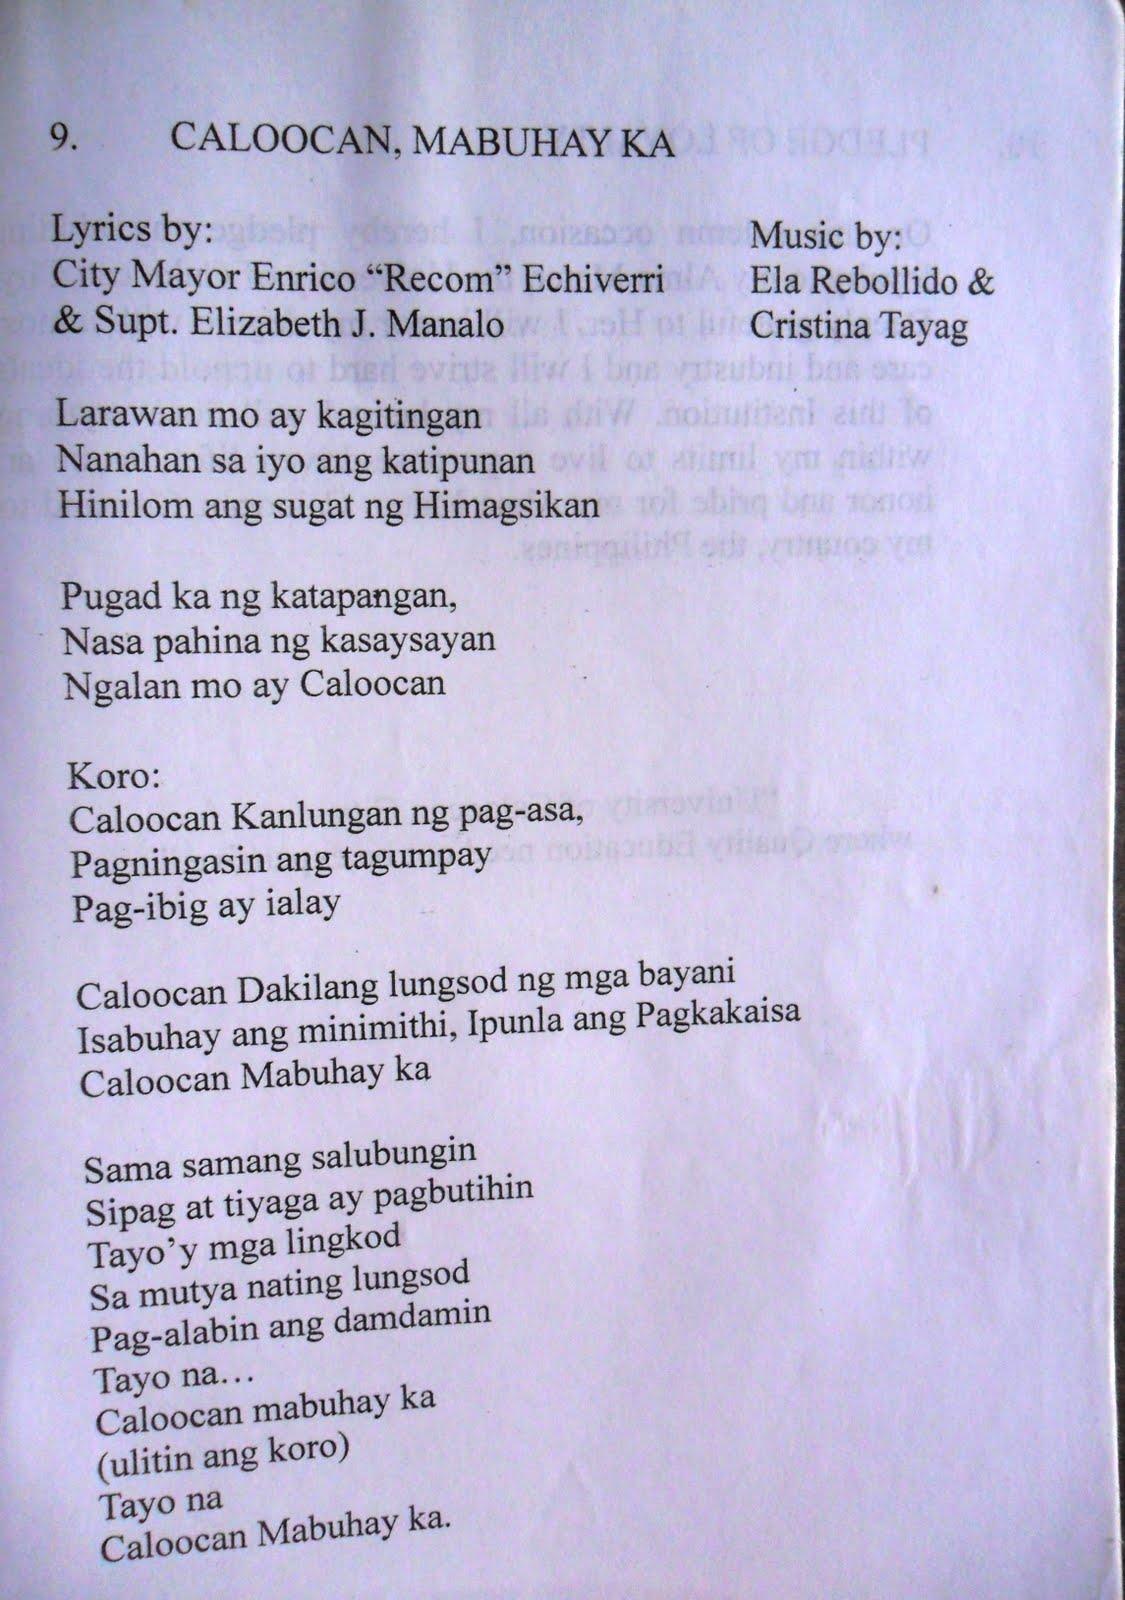 Lyrics mabuhay ka caloocan lyric songs about mabuhay ka ...